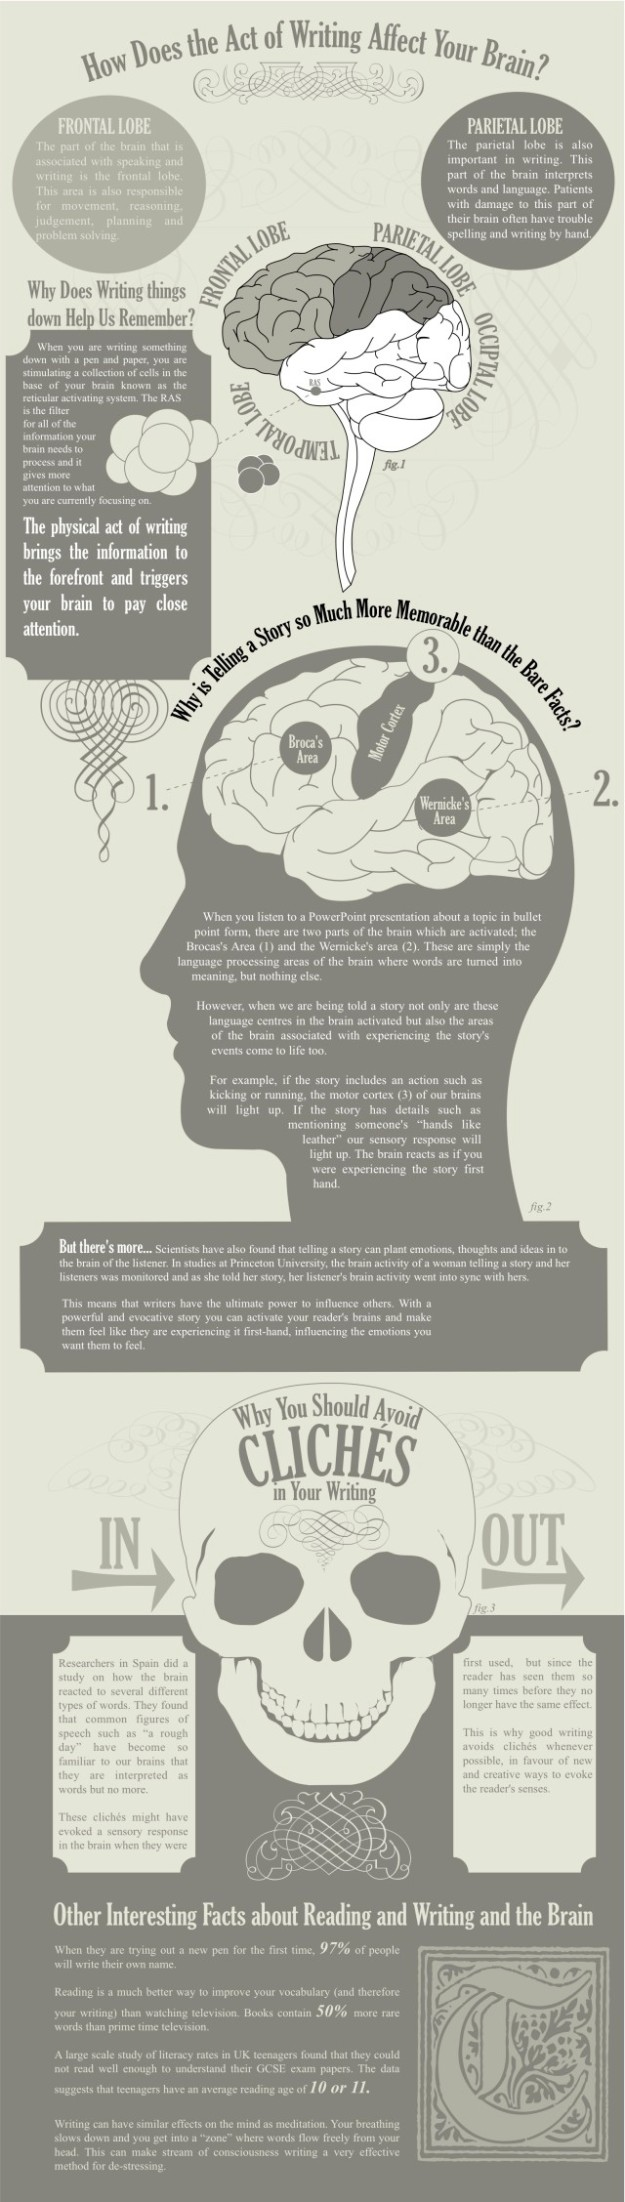 Writing&TheBrain